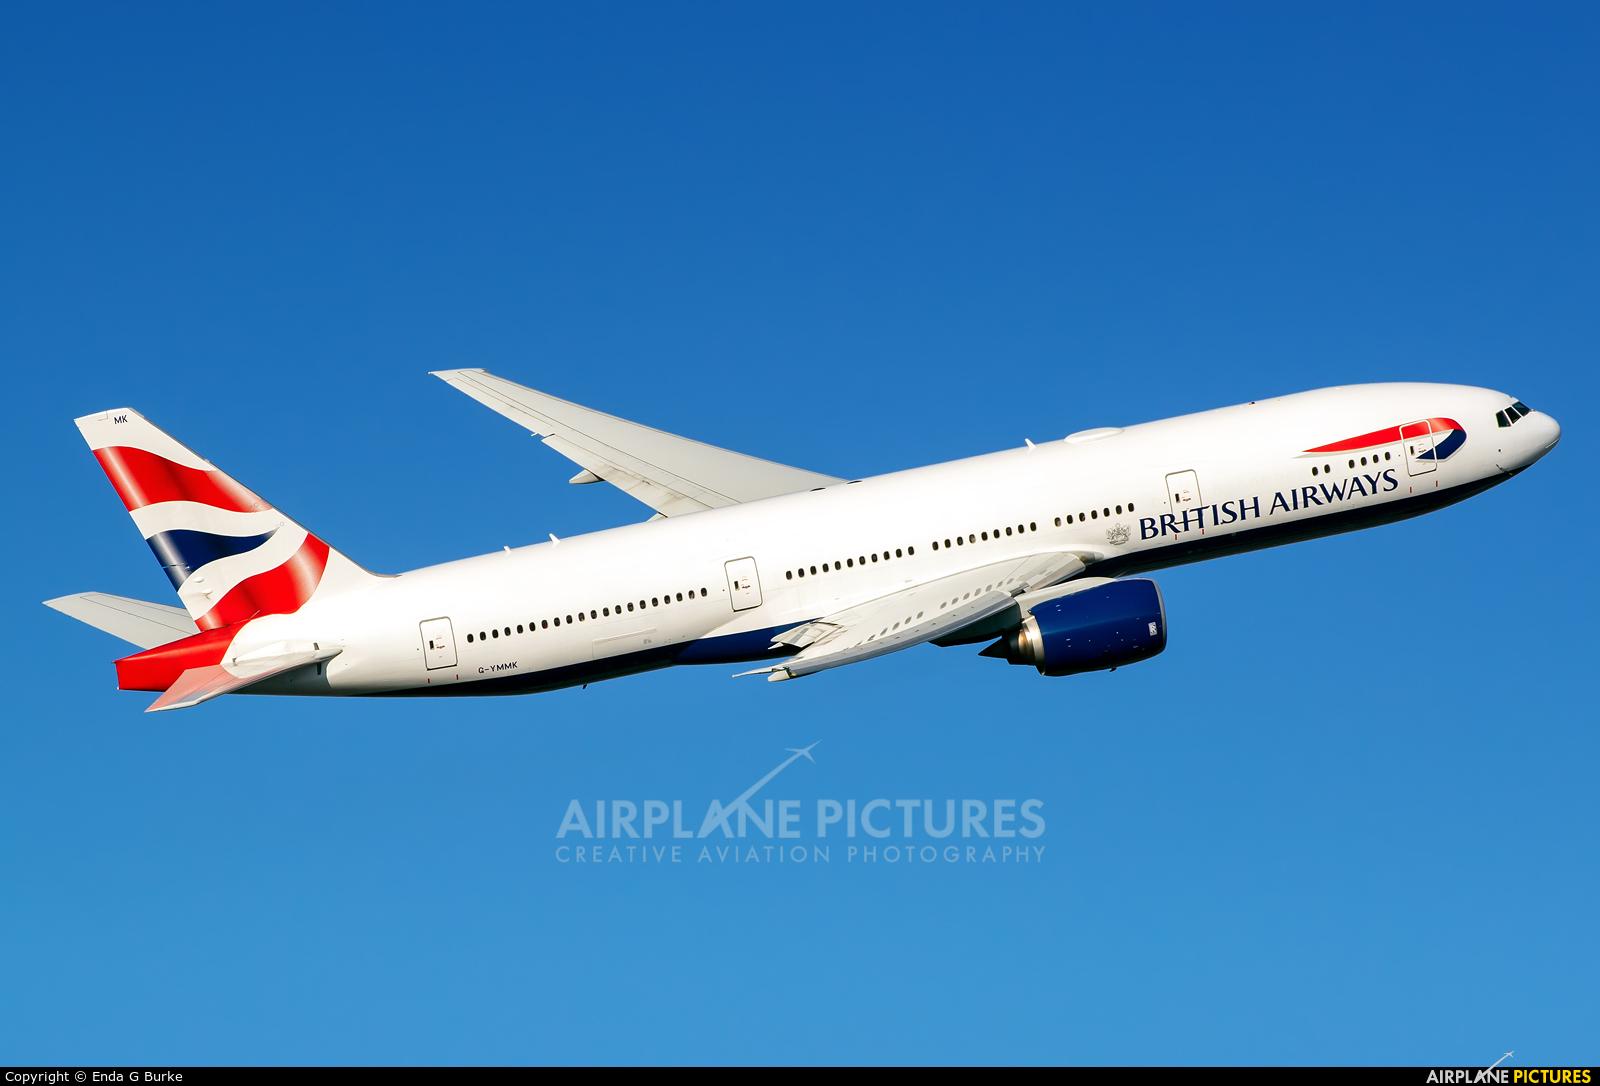 British Airways G-YMMK aircraft at London - Heathrow